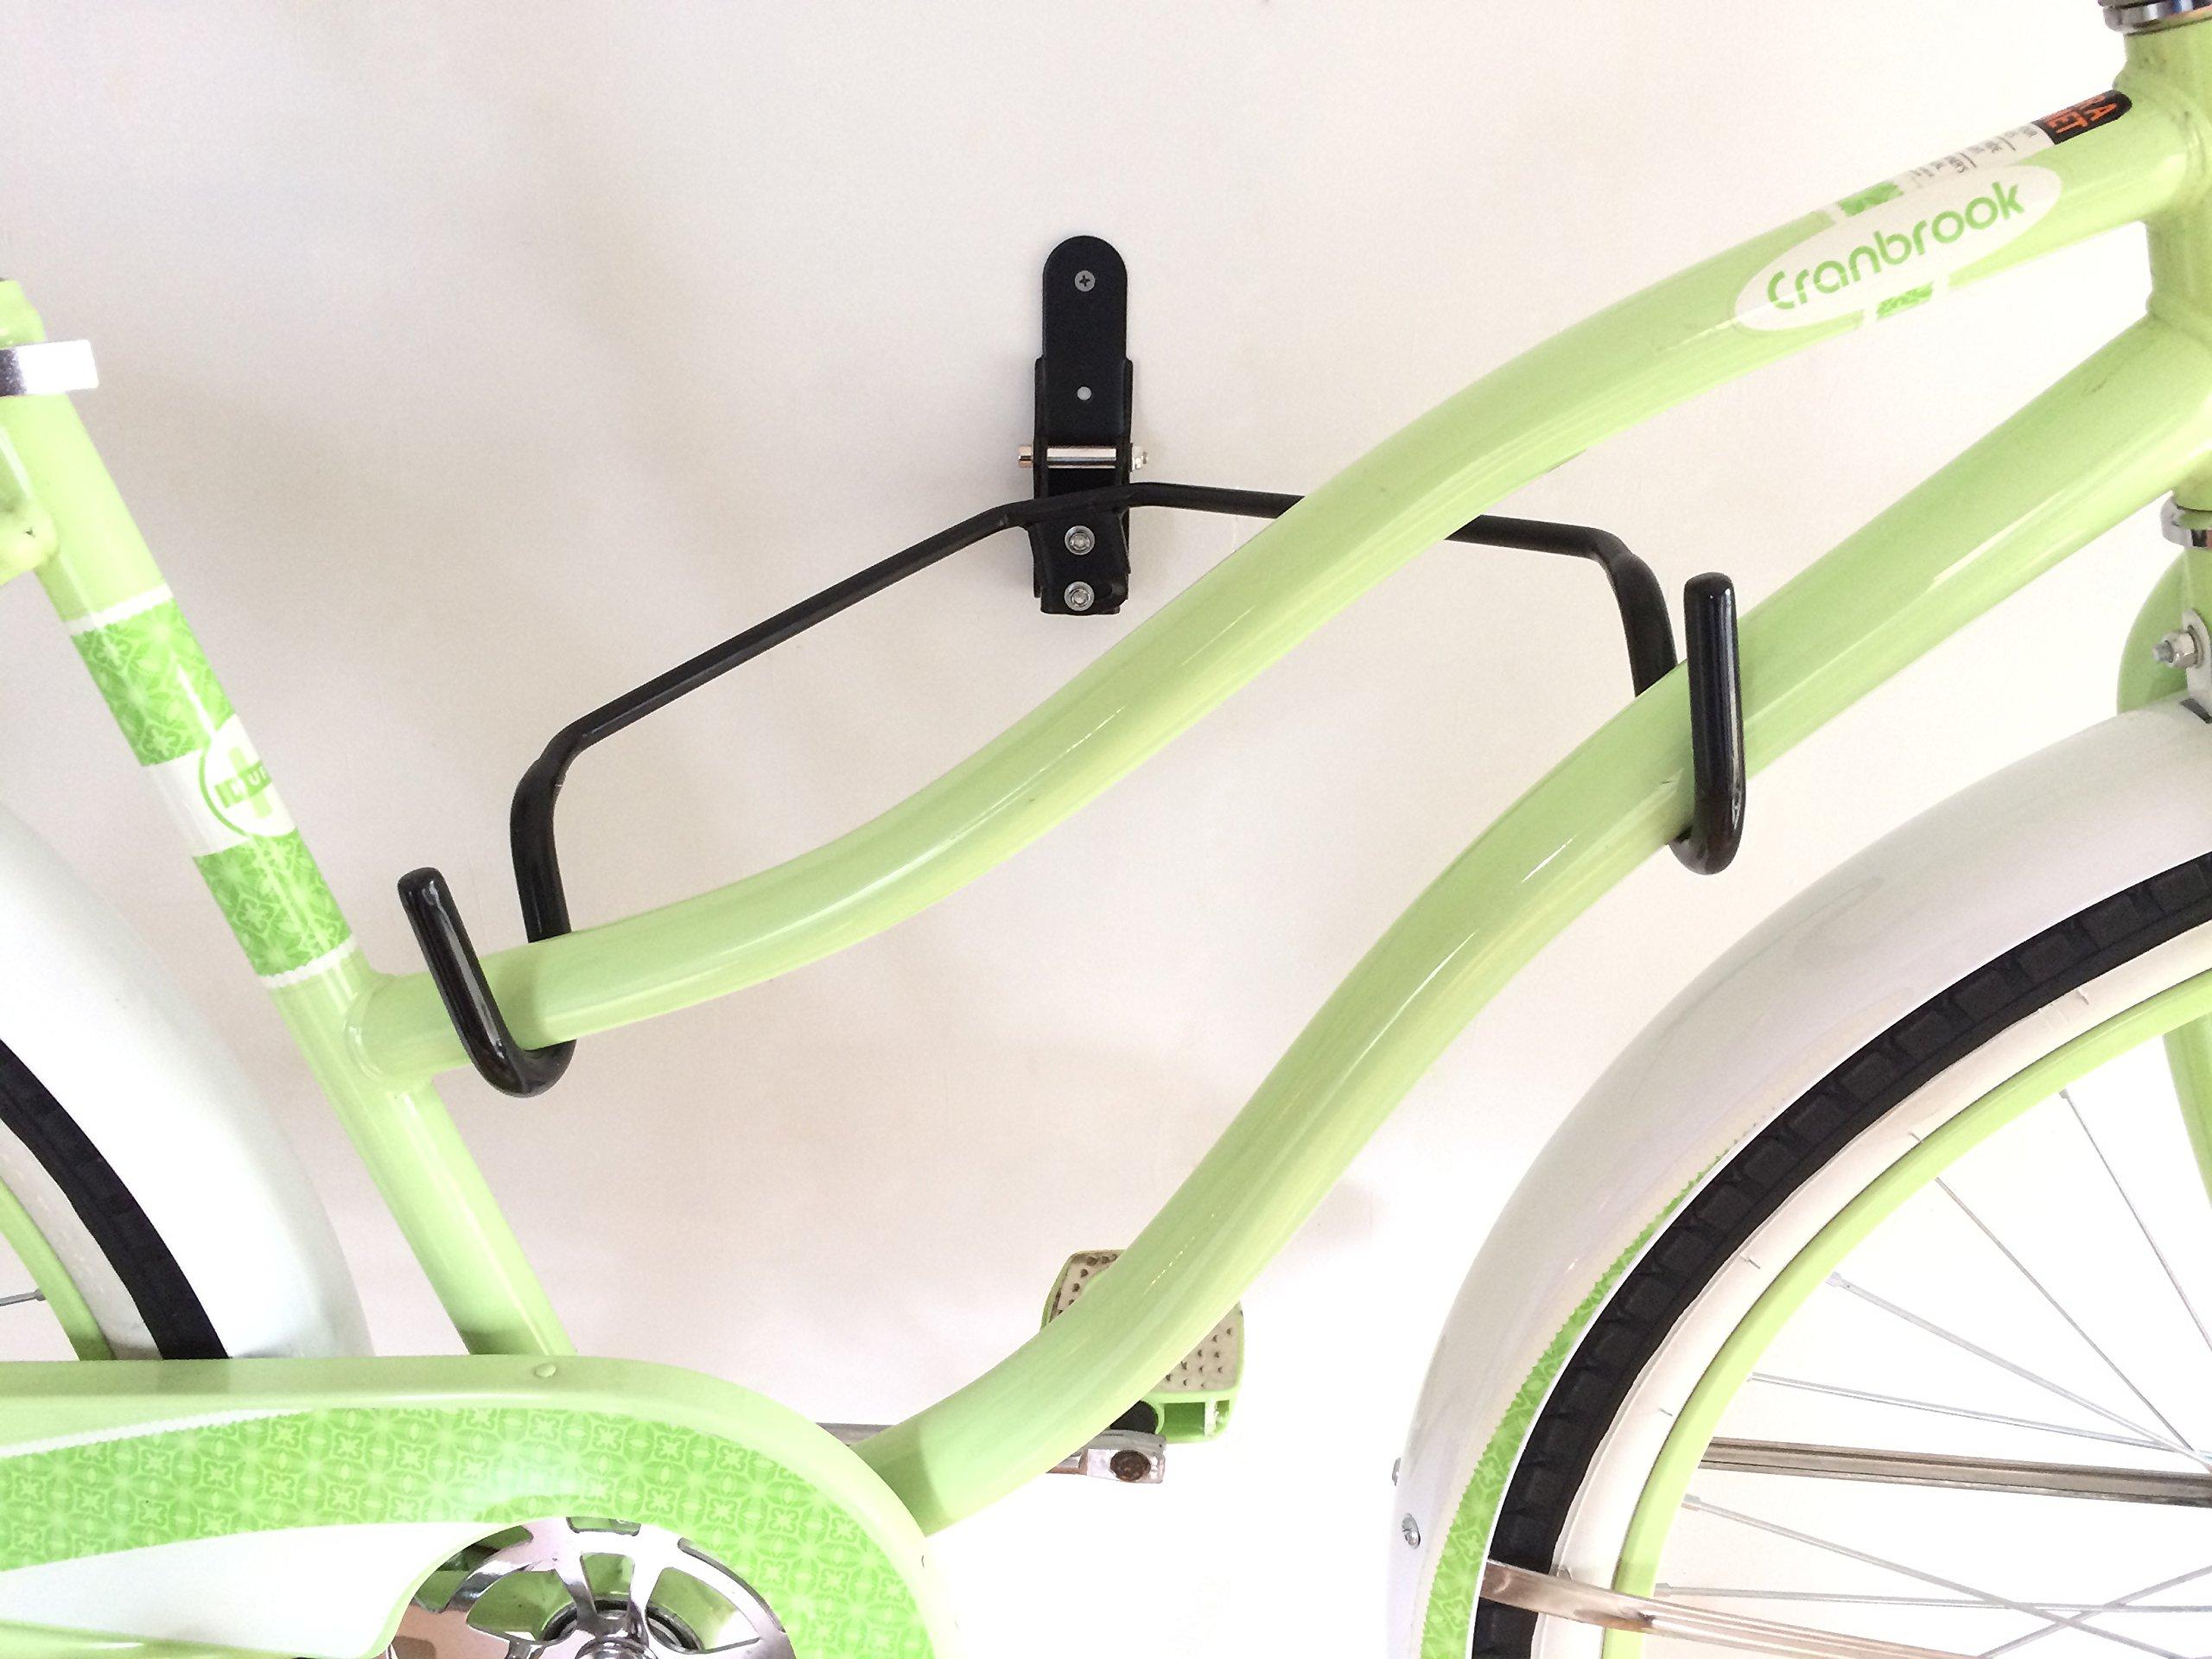 LifeStore Adjustable Tilt Wall Mount Bike Bicycle Storage Rack Hanger Hook by Coastal Provision (Image #3)